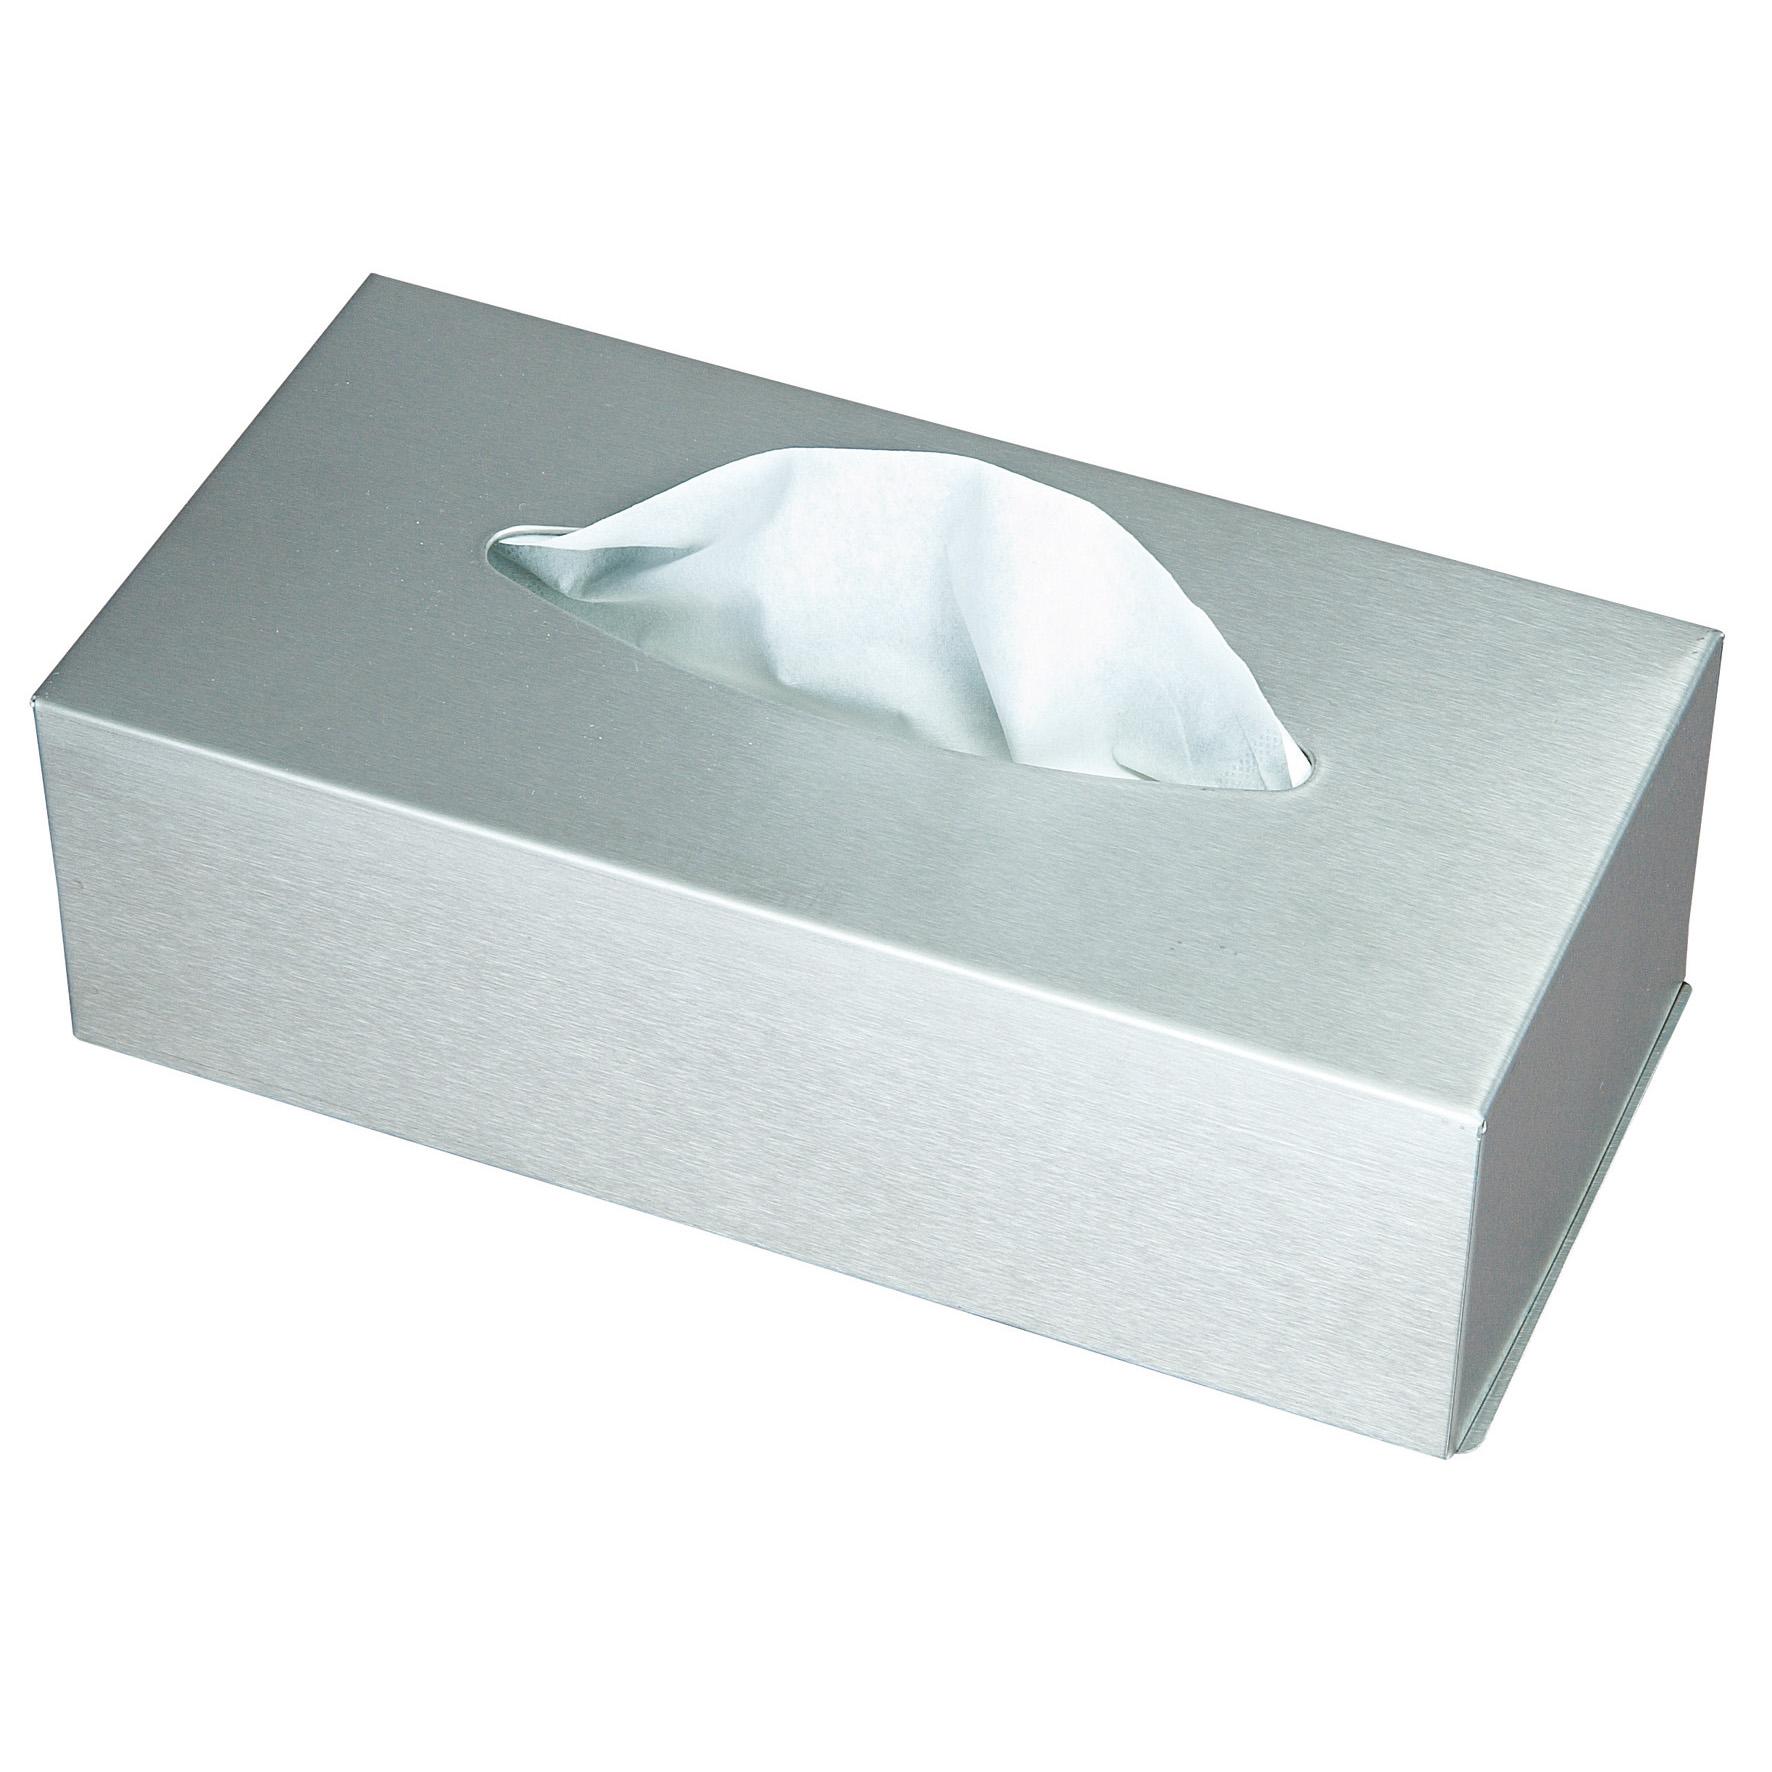 kosmetik kosmetiktuch box kosmetikbox edelstahl tissuebox kosmetikt cherbox neu ebay. Black Bedroom Furniture Sets. Home Design Ideas